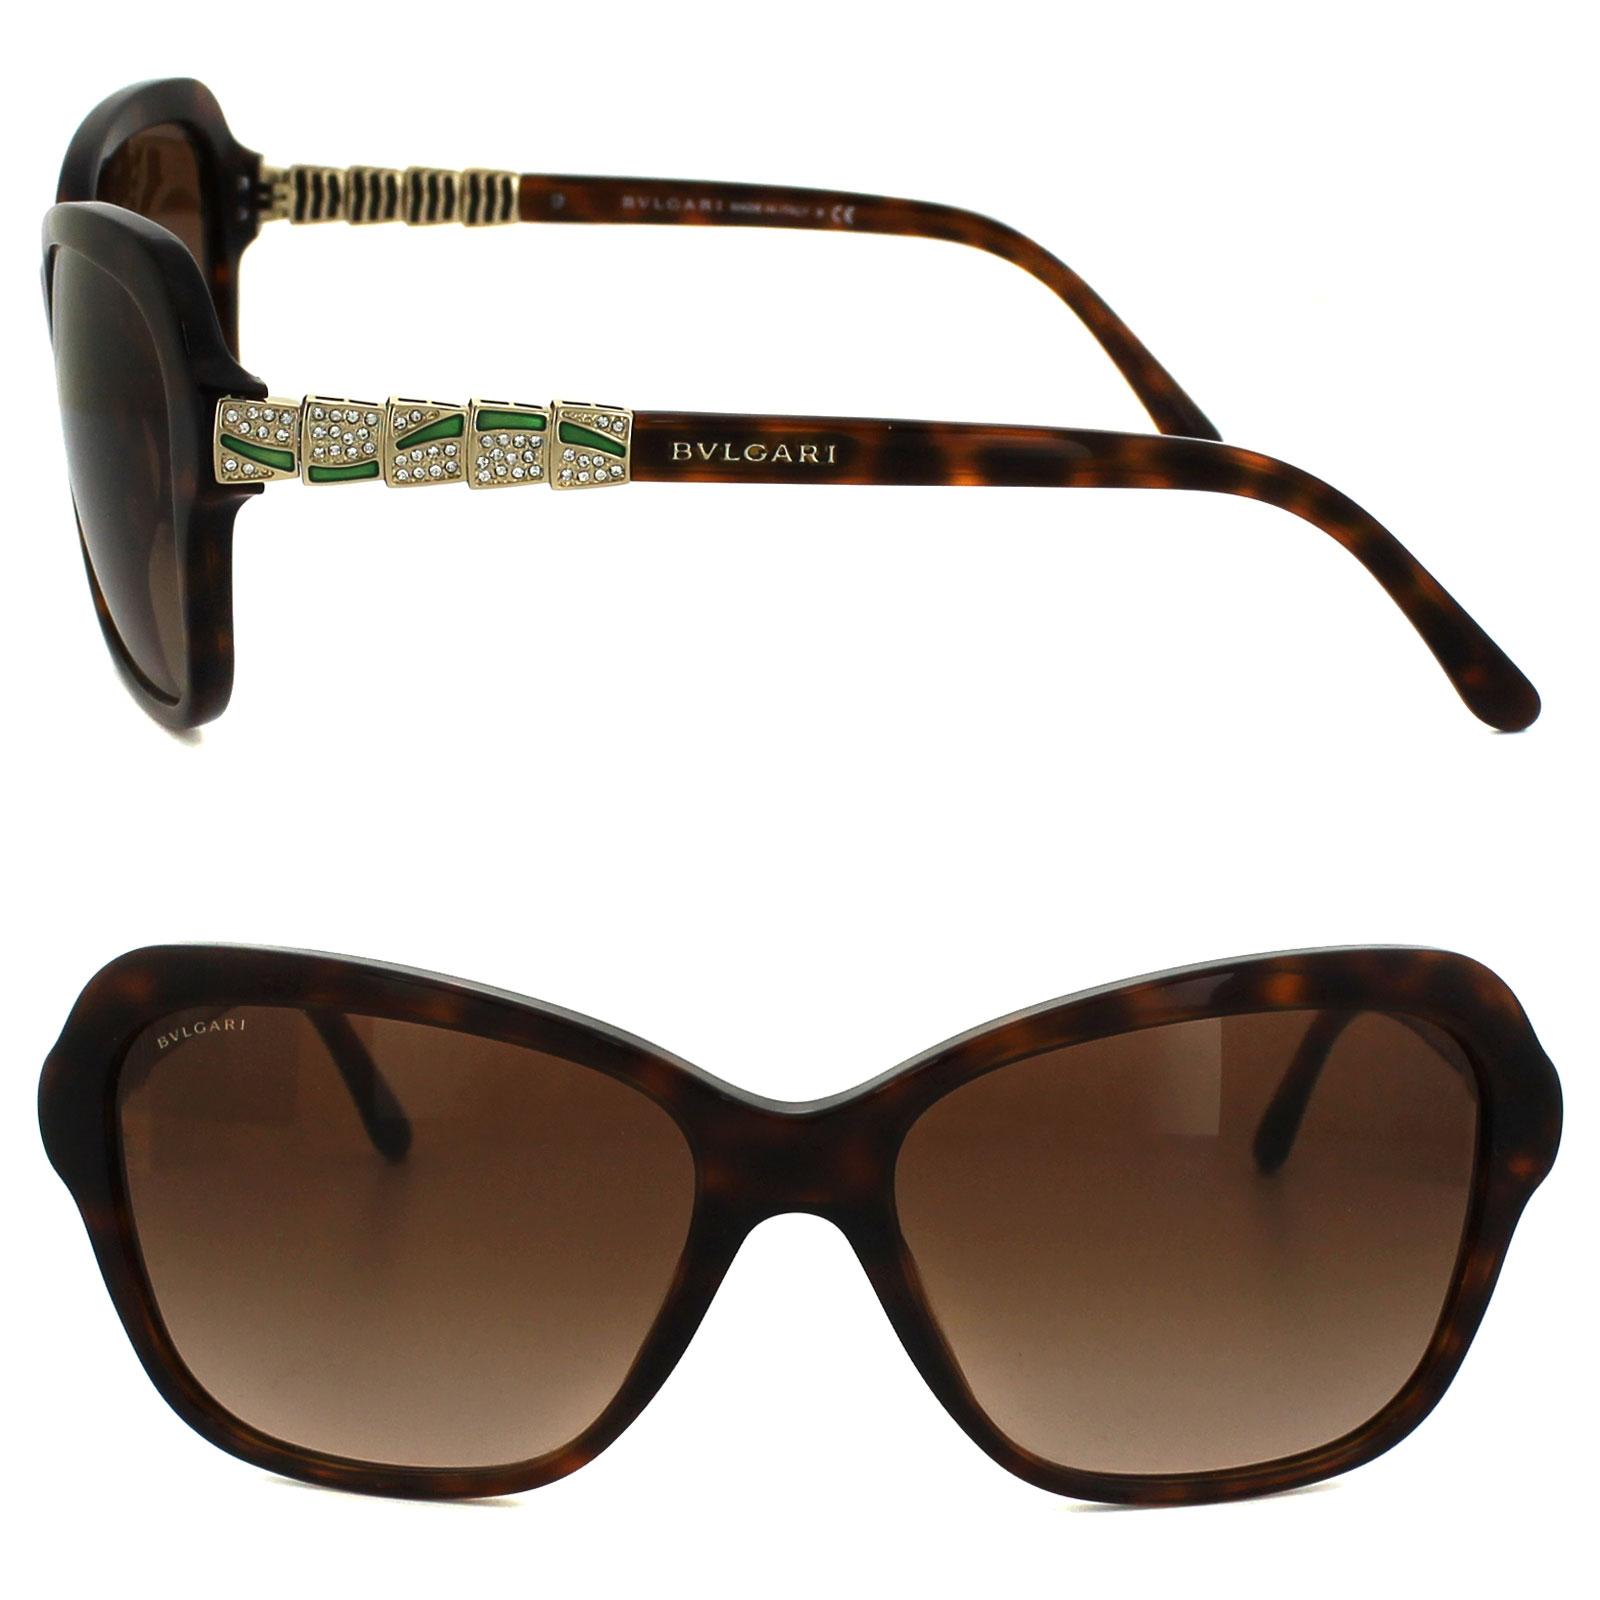 1ed5fc5a75 Sentinel Bvlgari Sunglasses 8142B 526813 Blonde Havana Brown Gradient